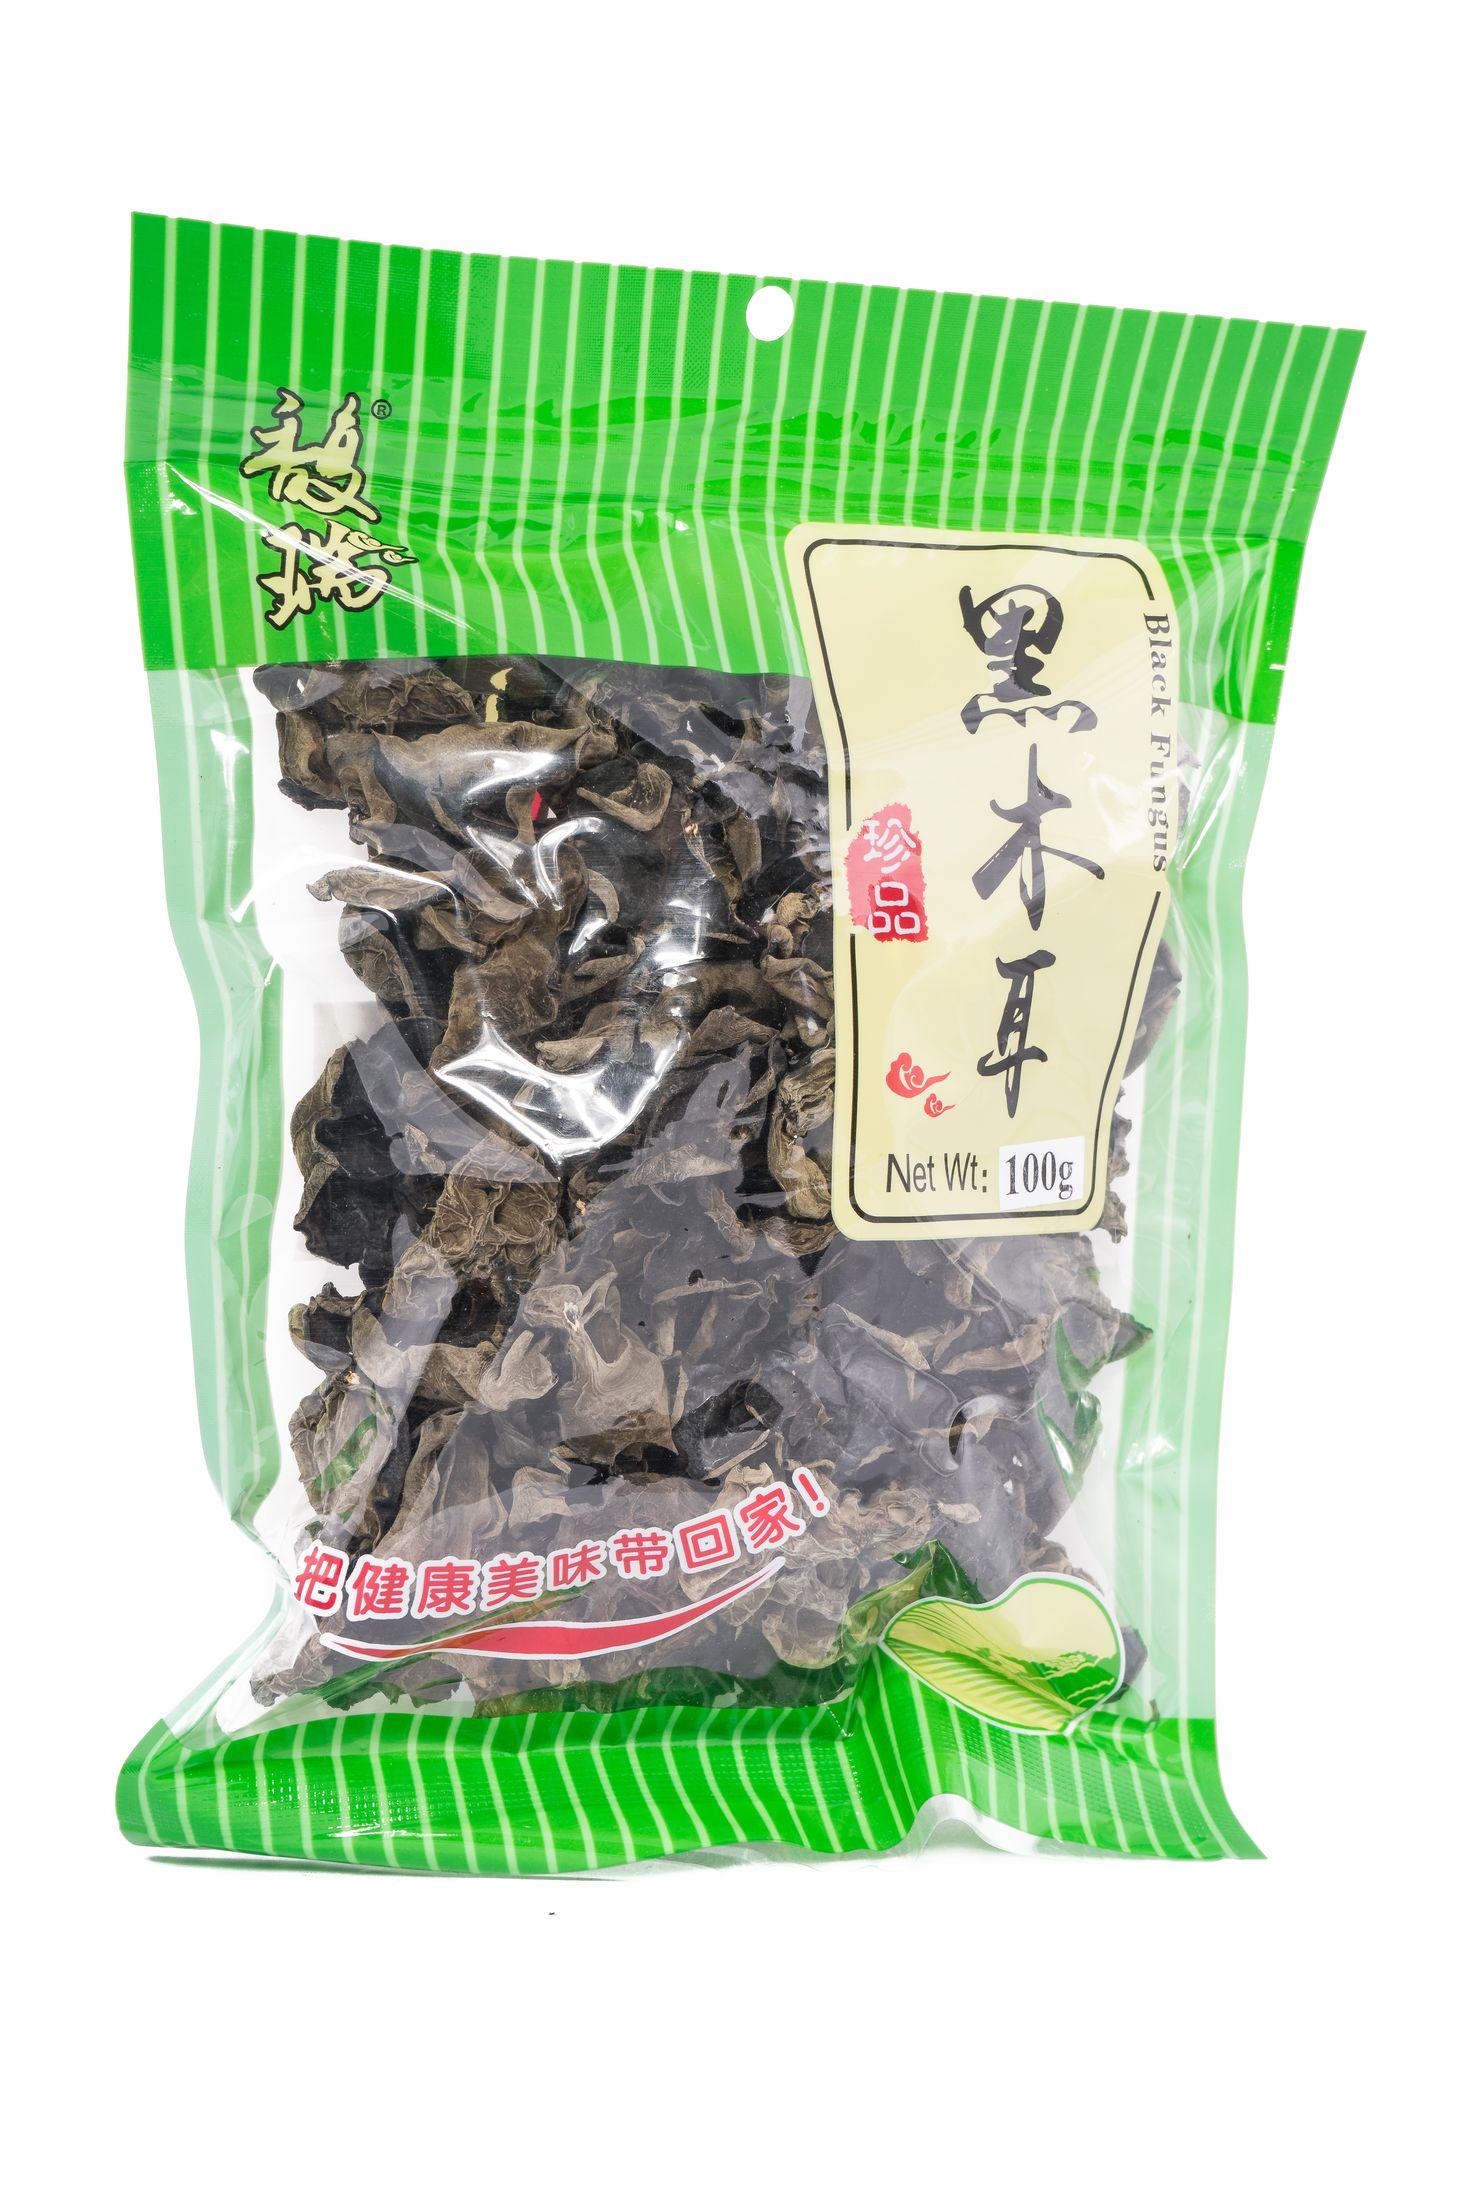 Black fungus (黑木耳)